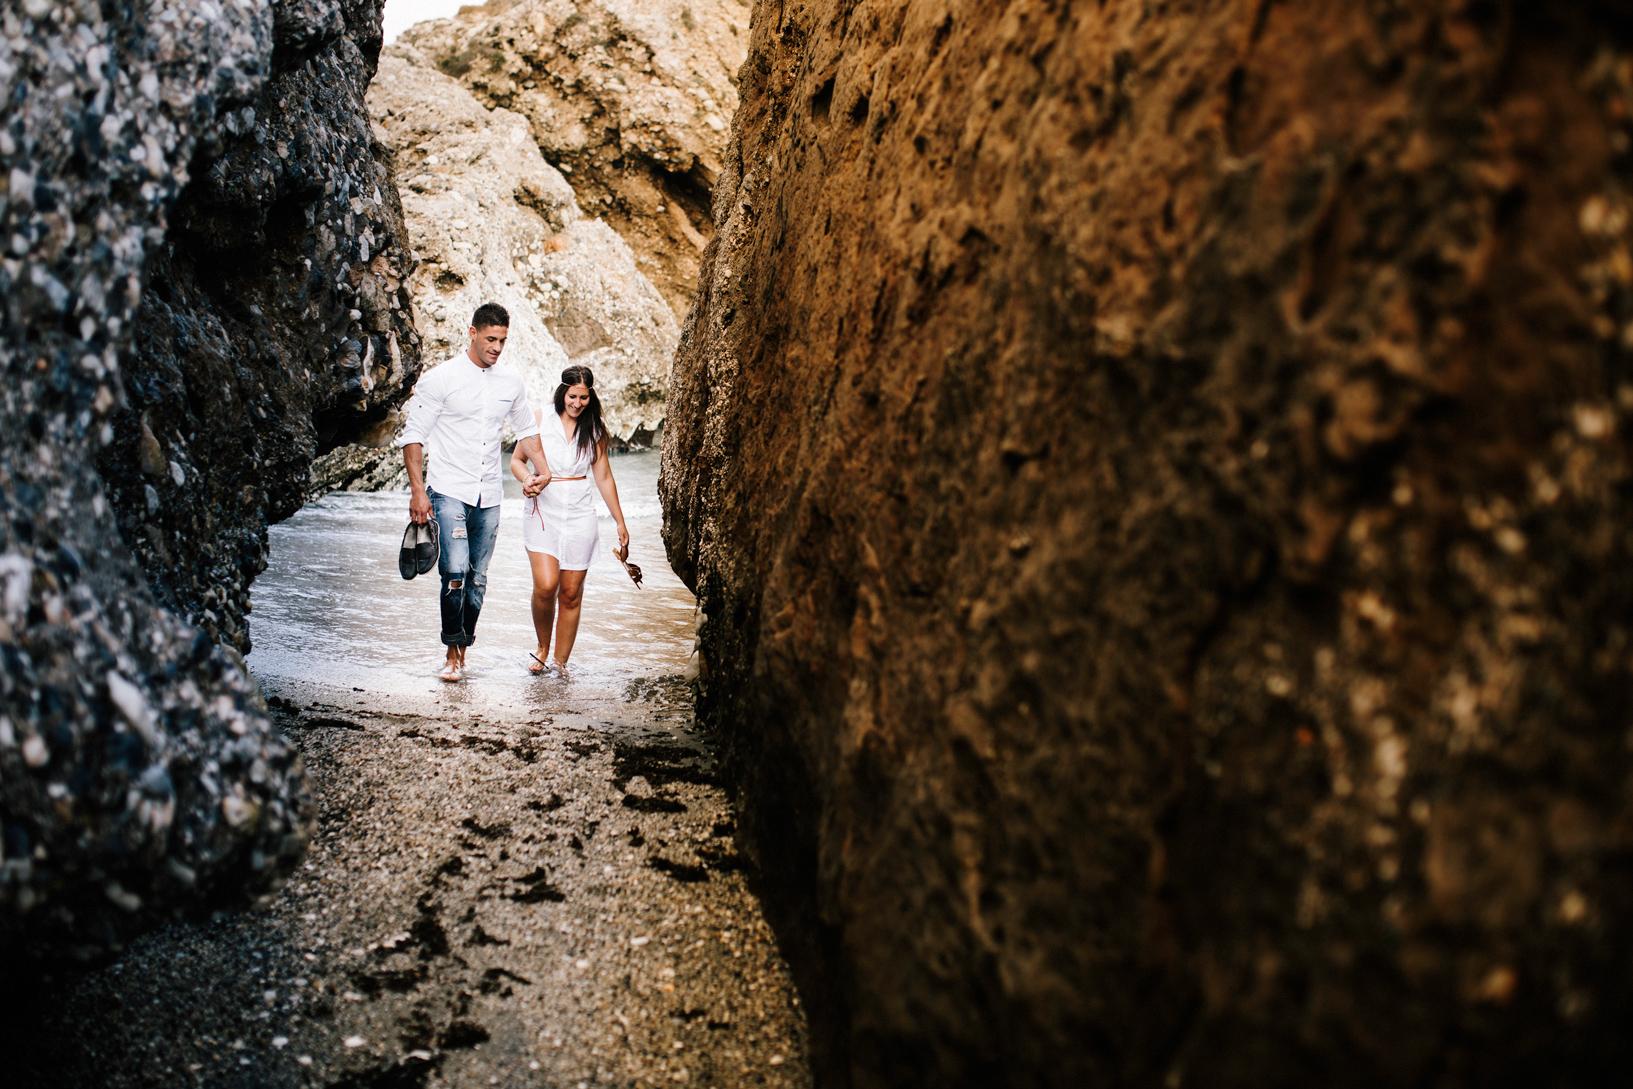 Pre boda en nerja (málaga) de Luis & Rocío